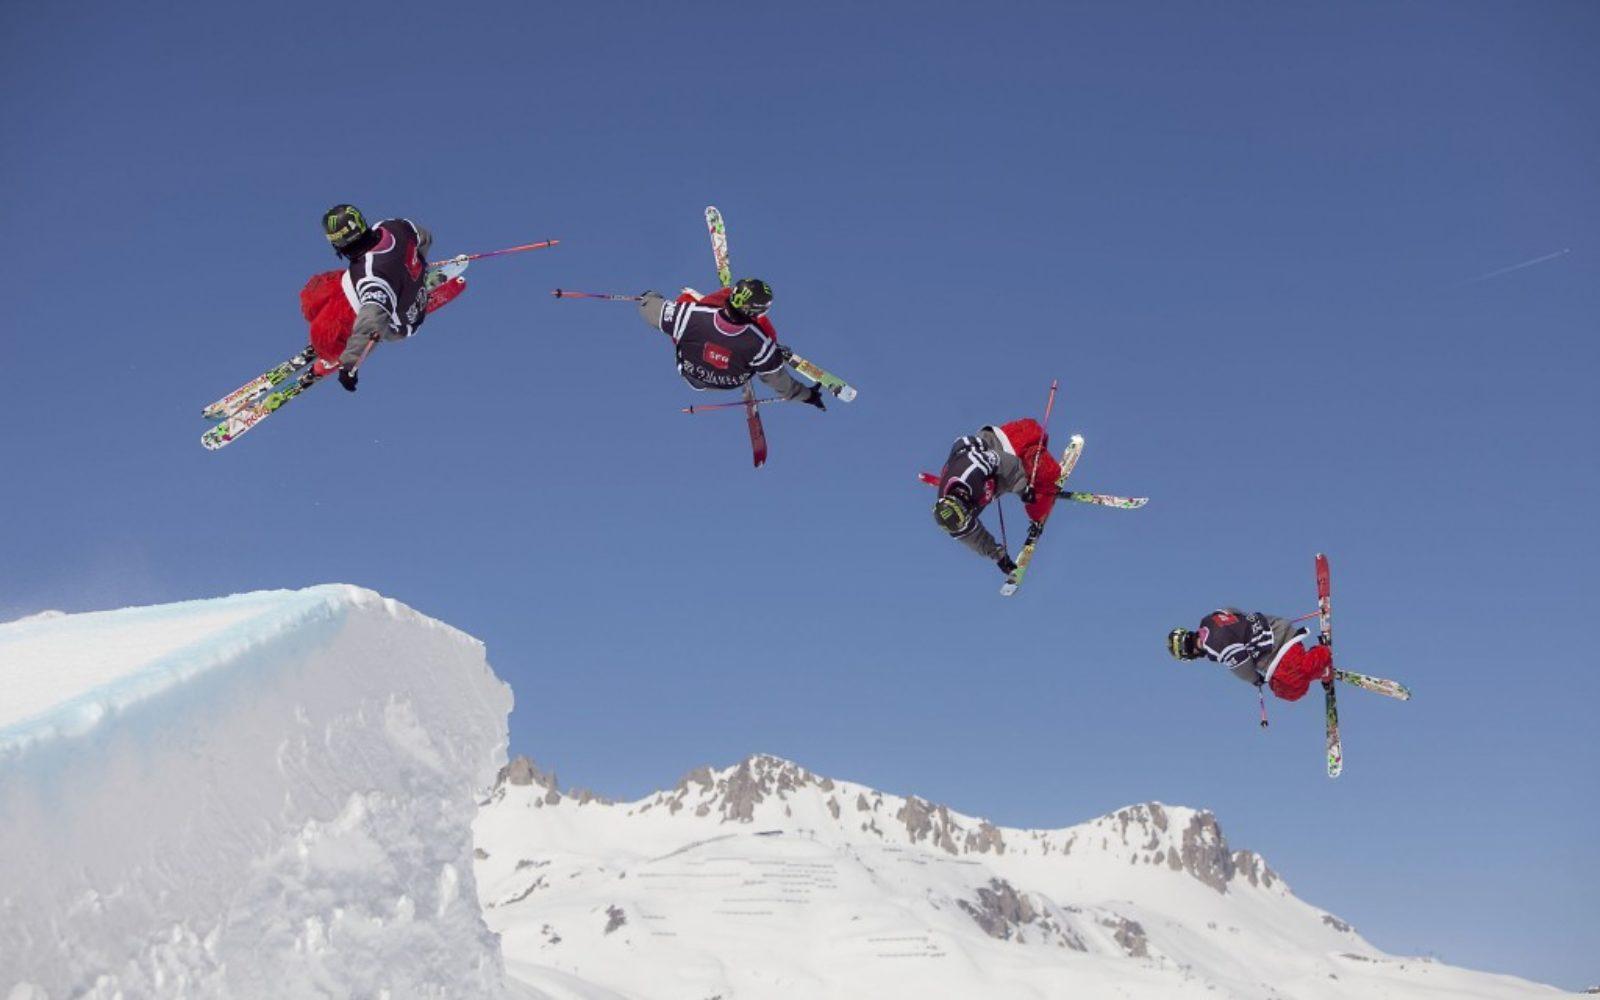 sports-xgames-skier-timelapse-1024x640